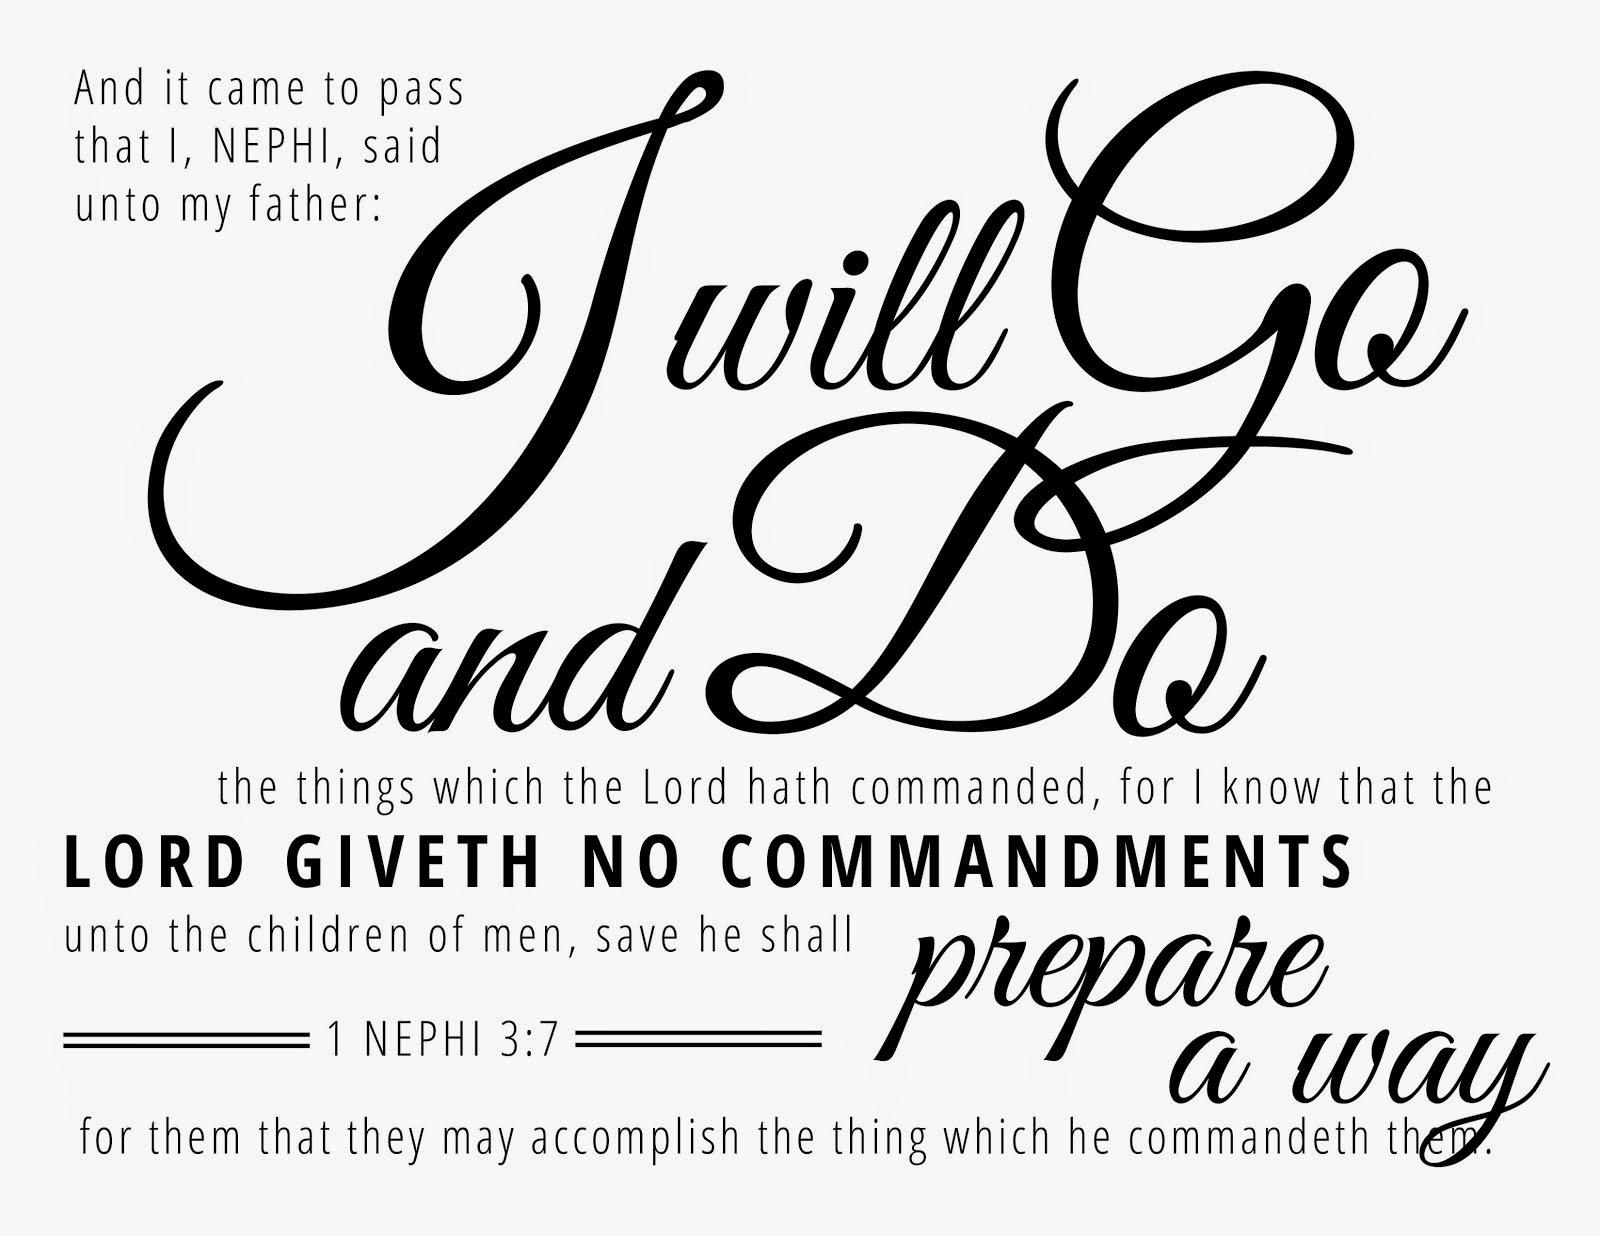 Book of Mormon Scripture Mastery Set